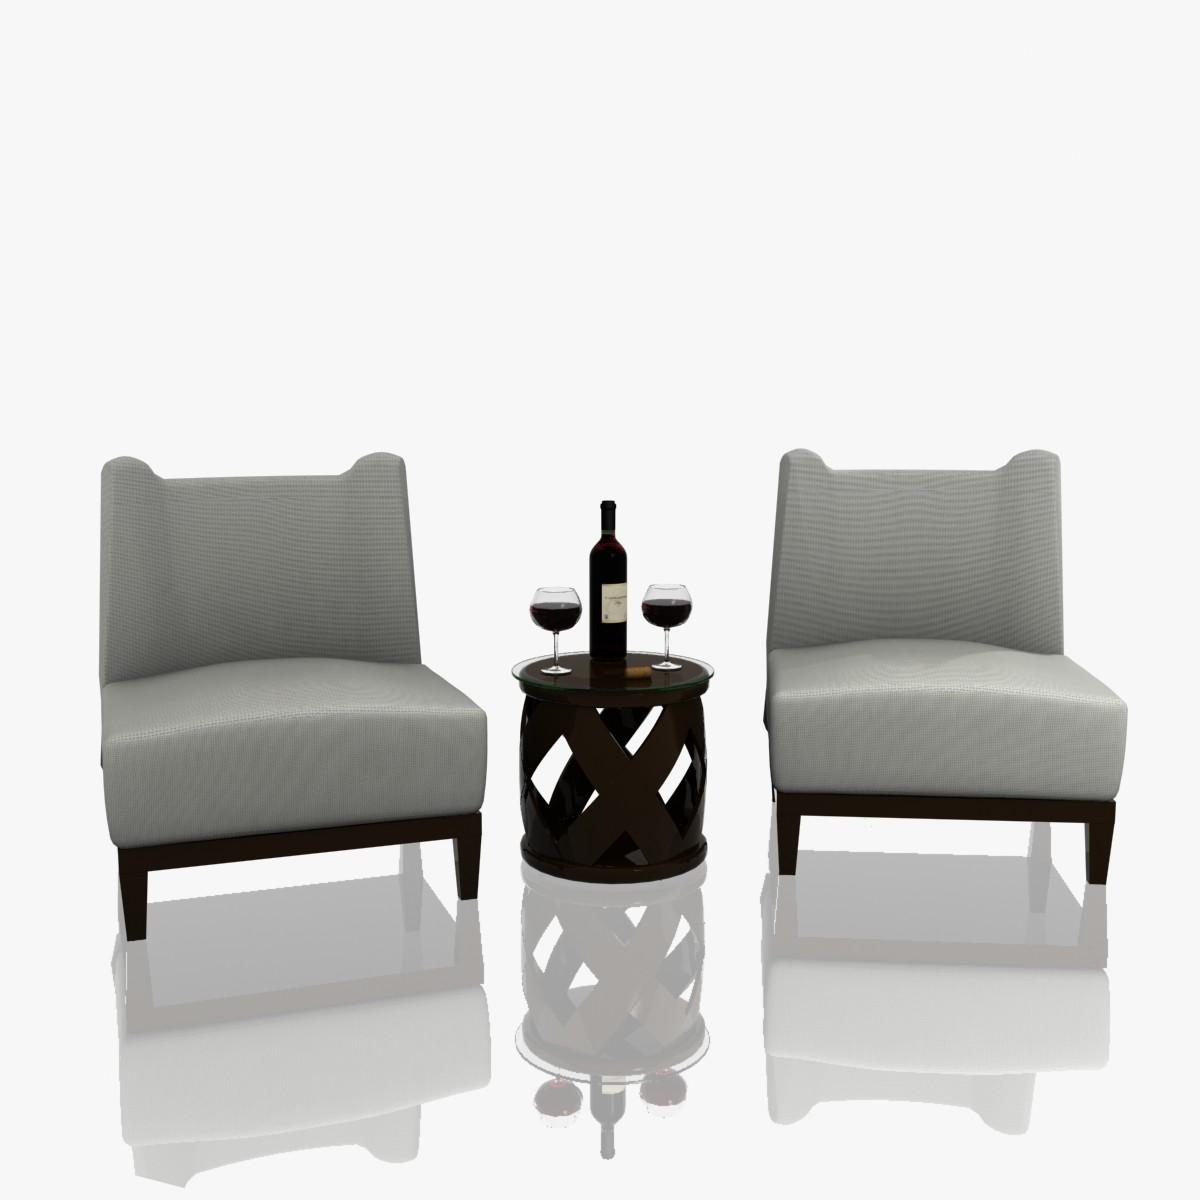 Contemporary_Chair_Model_Camera01_0f.jpg